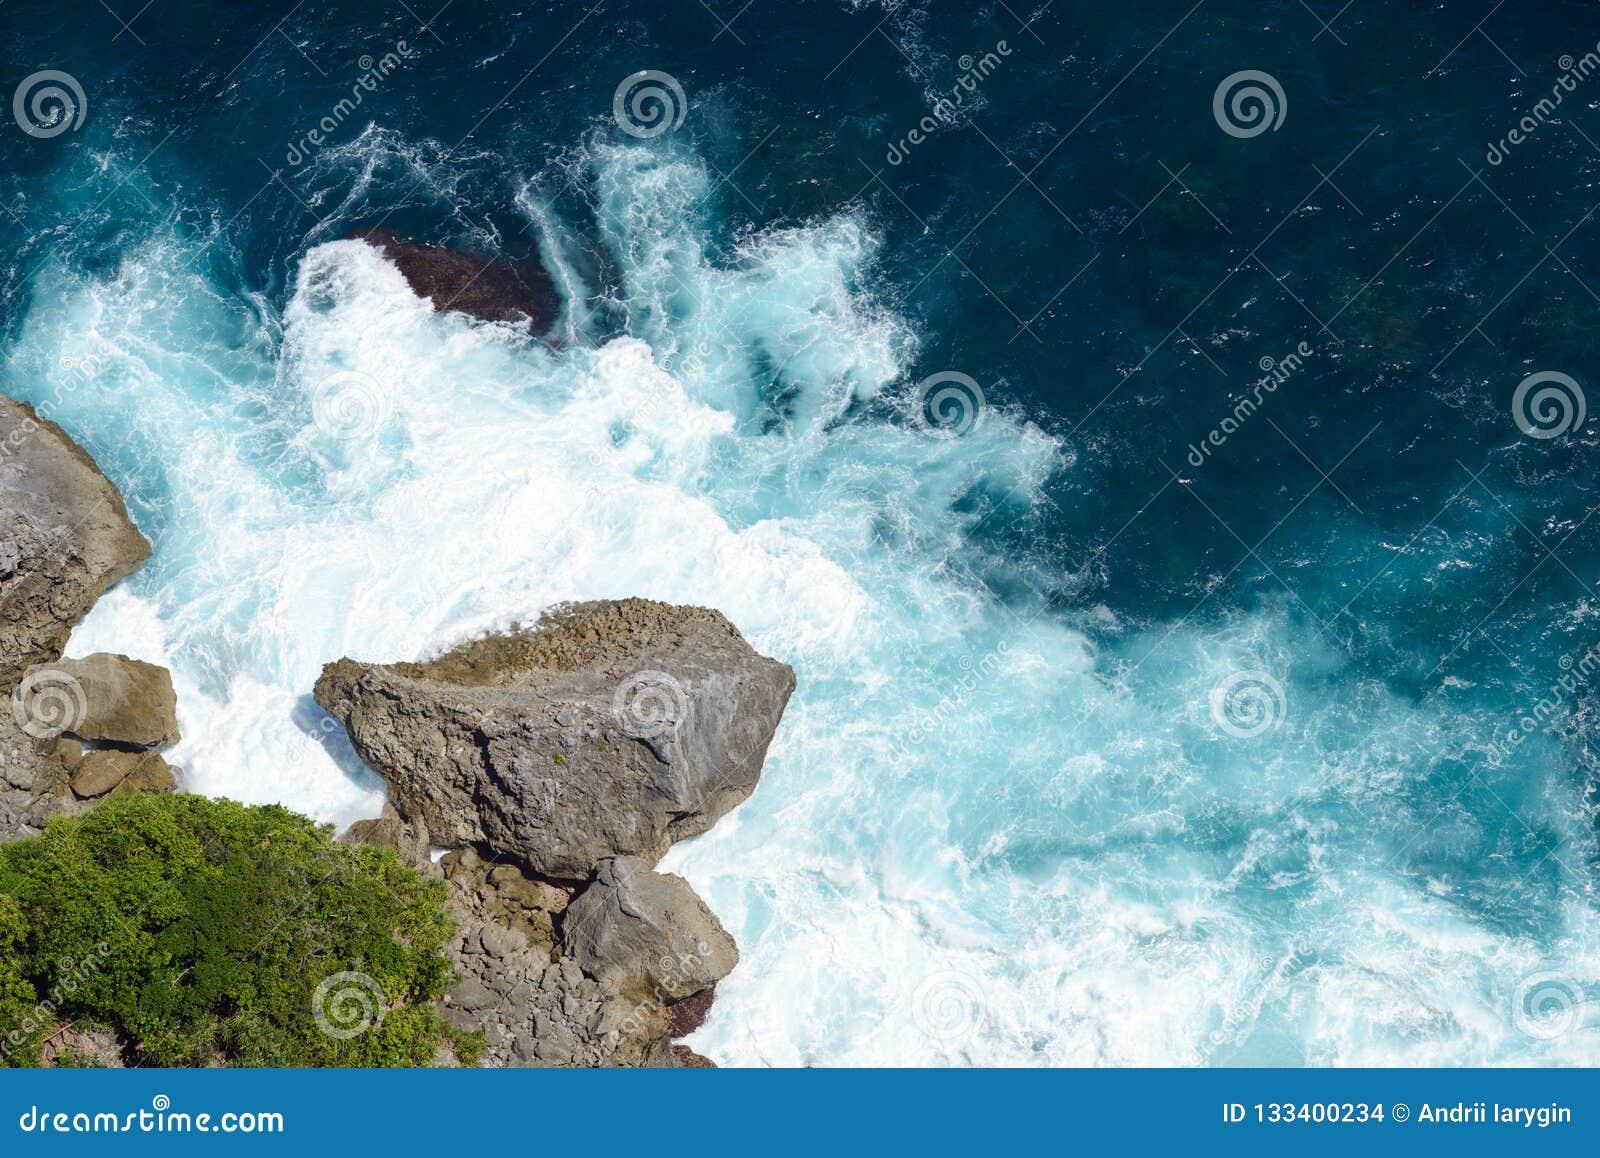 Break ocean aerial photography